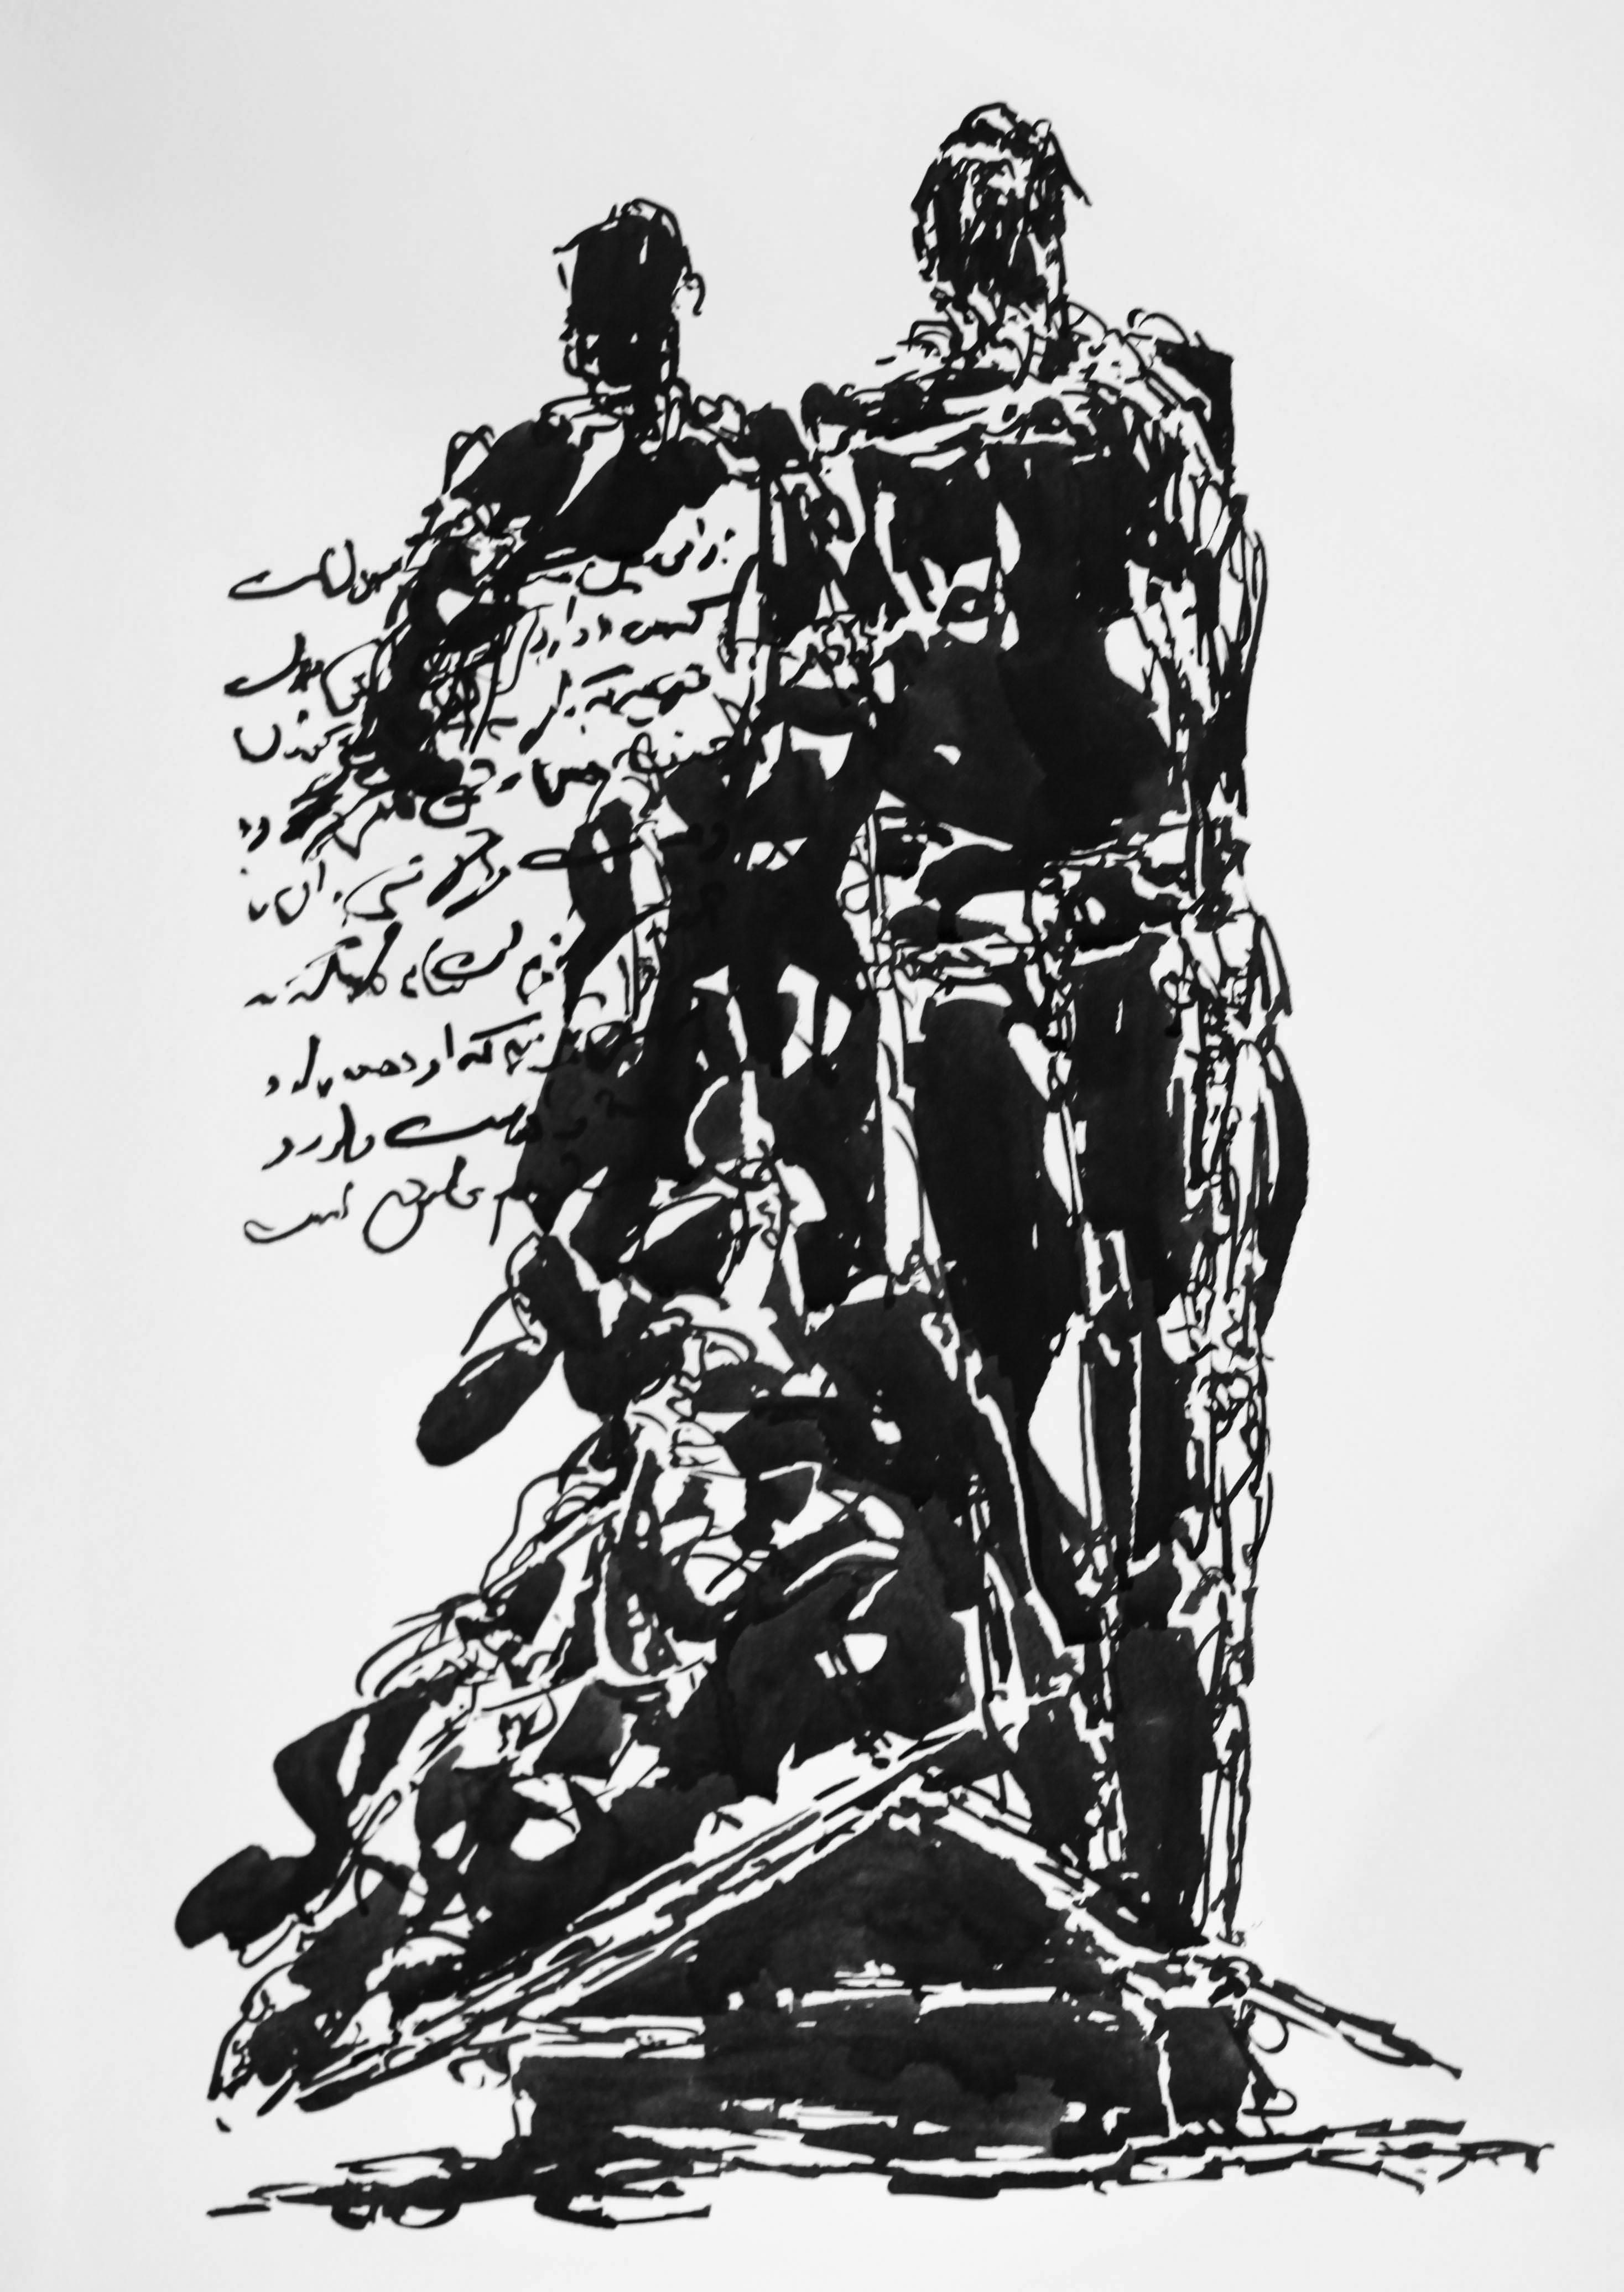 Untitled - Farzad Kohan - 24x18 - 2016 (1 of 4)